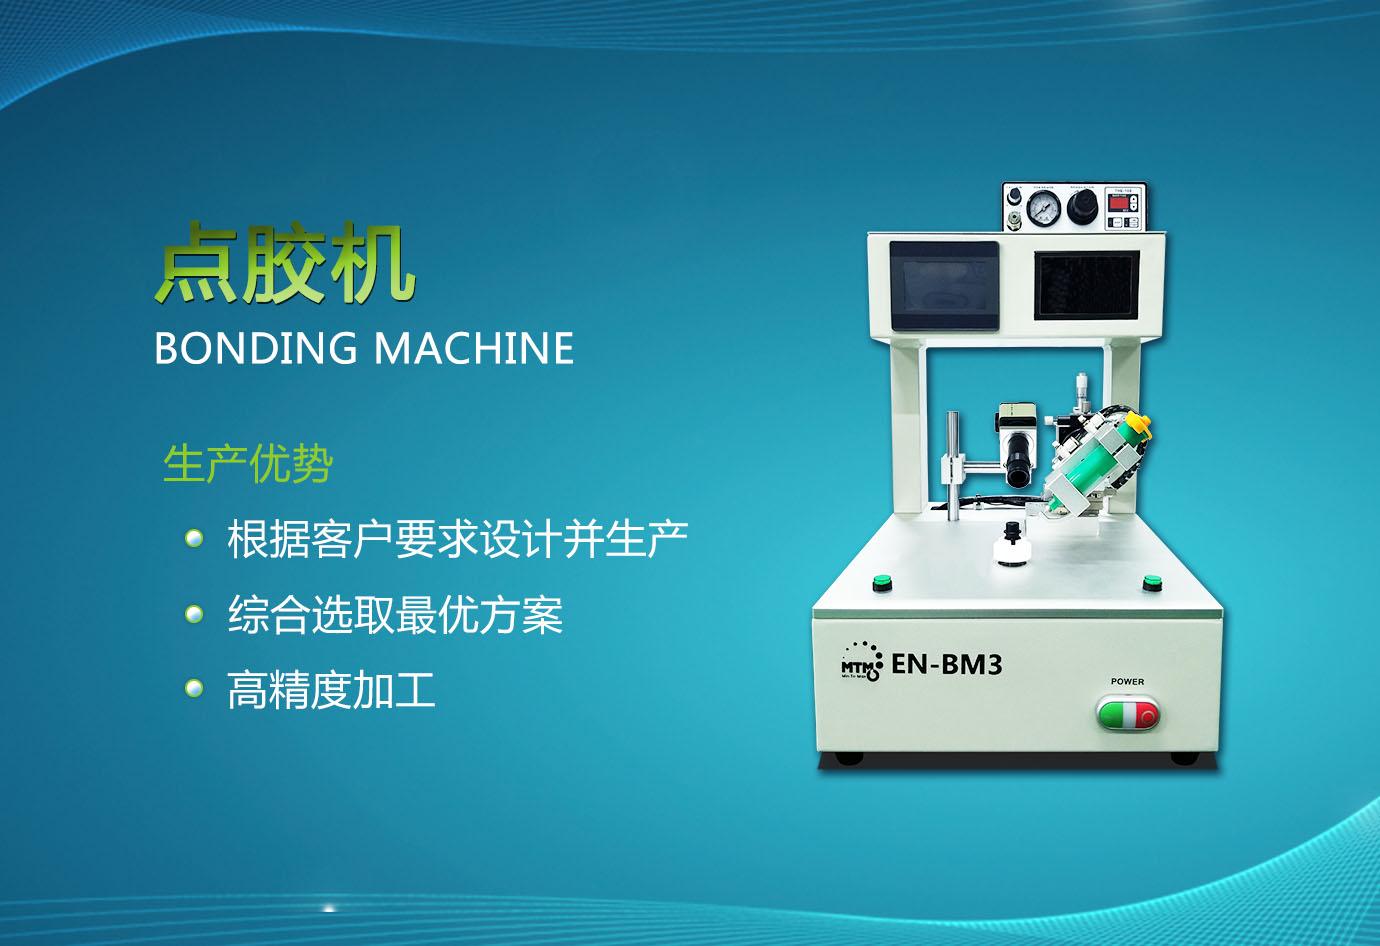 BONDING MACHINE 【EN-BM3】